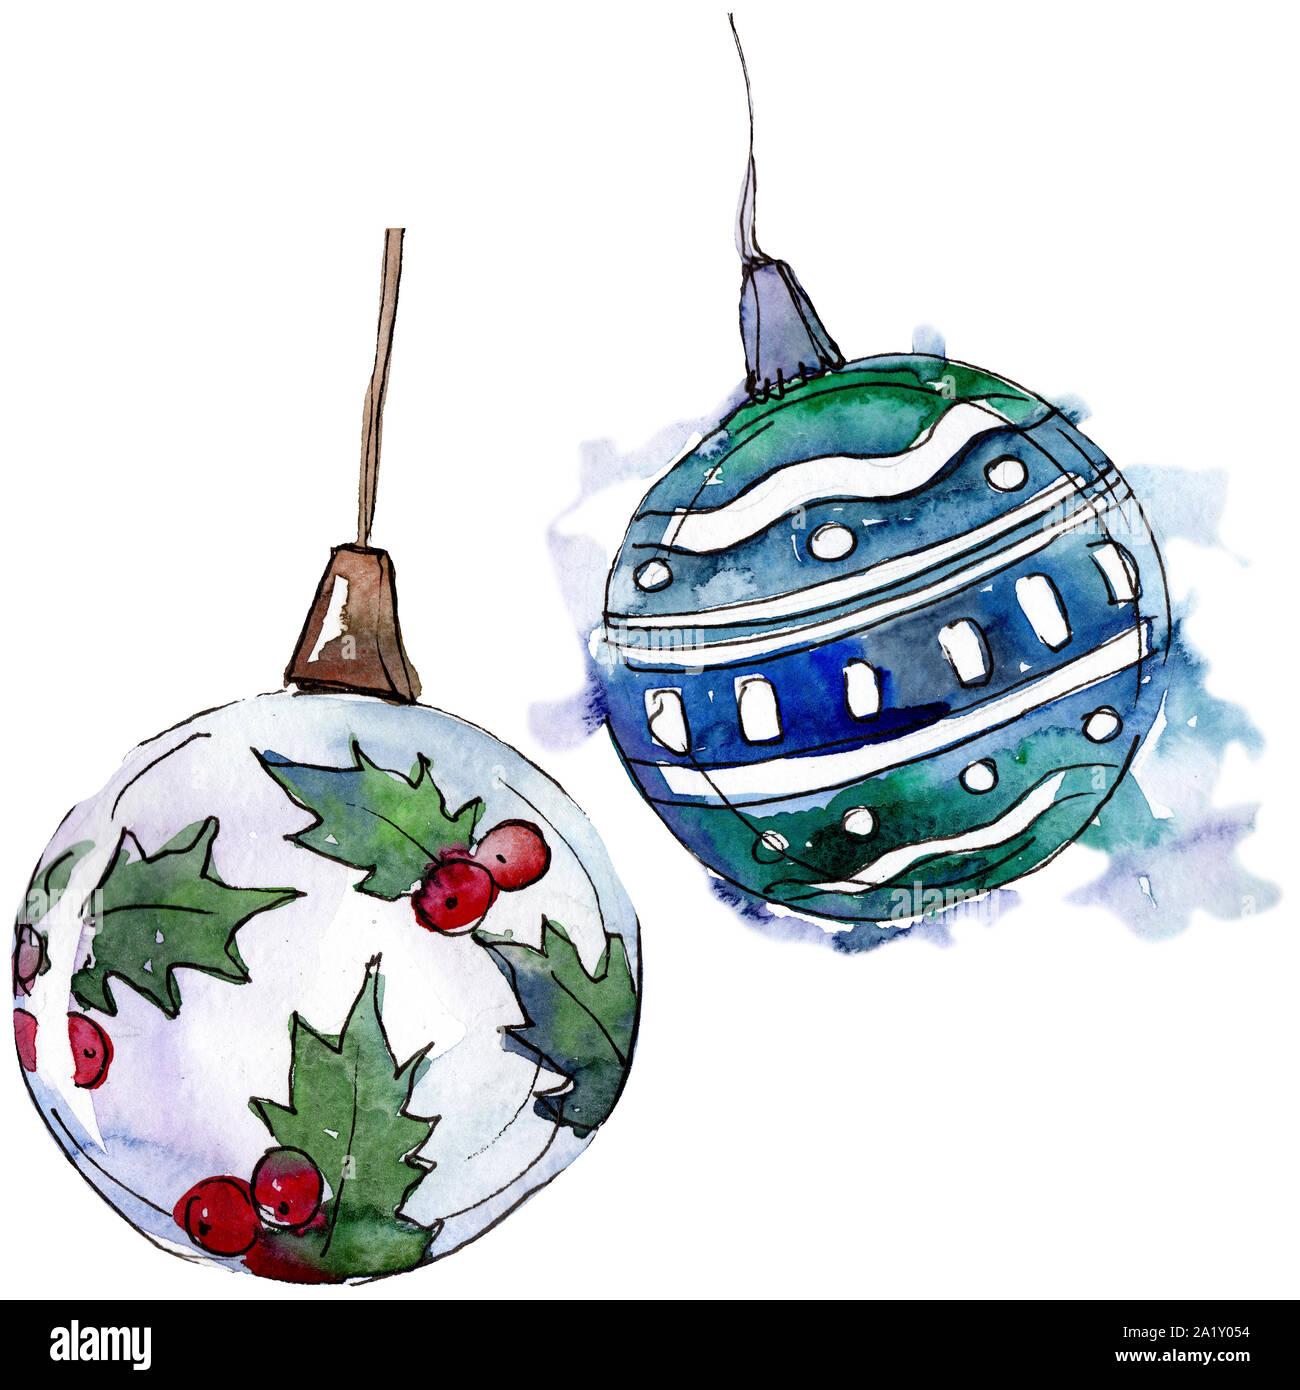 Christmas Clipart | Winter Holiday Doors Creator | Christmas Watercolor  clipart| Winter clipart. | Christmas Deco| New Year clipart in 2020 | Watercolor  clipart, Christmas watercolor, Minimalist christmas card